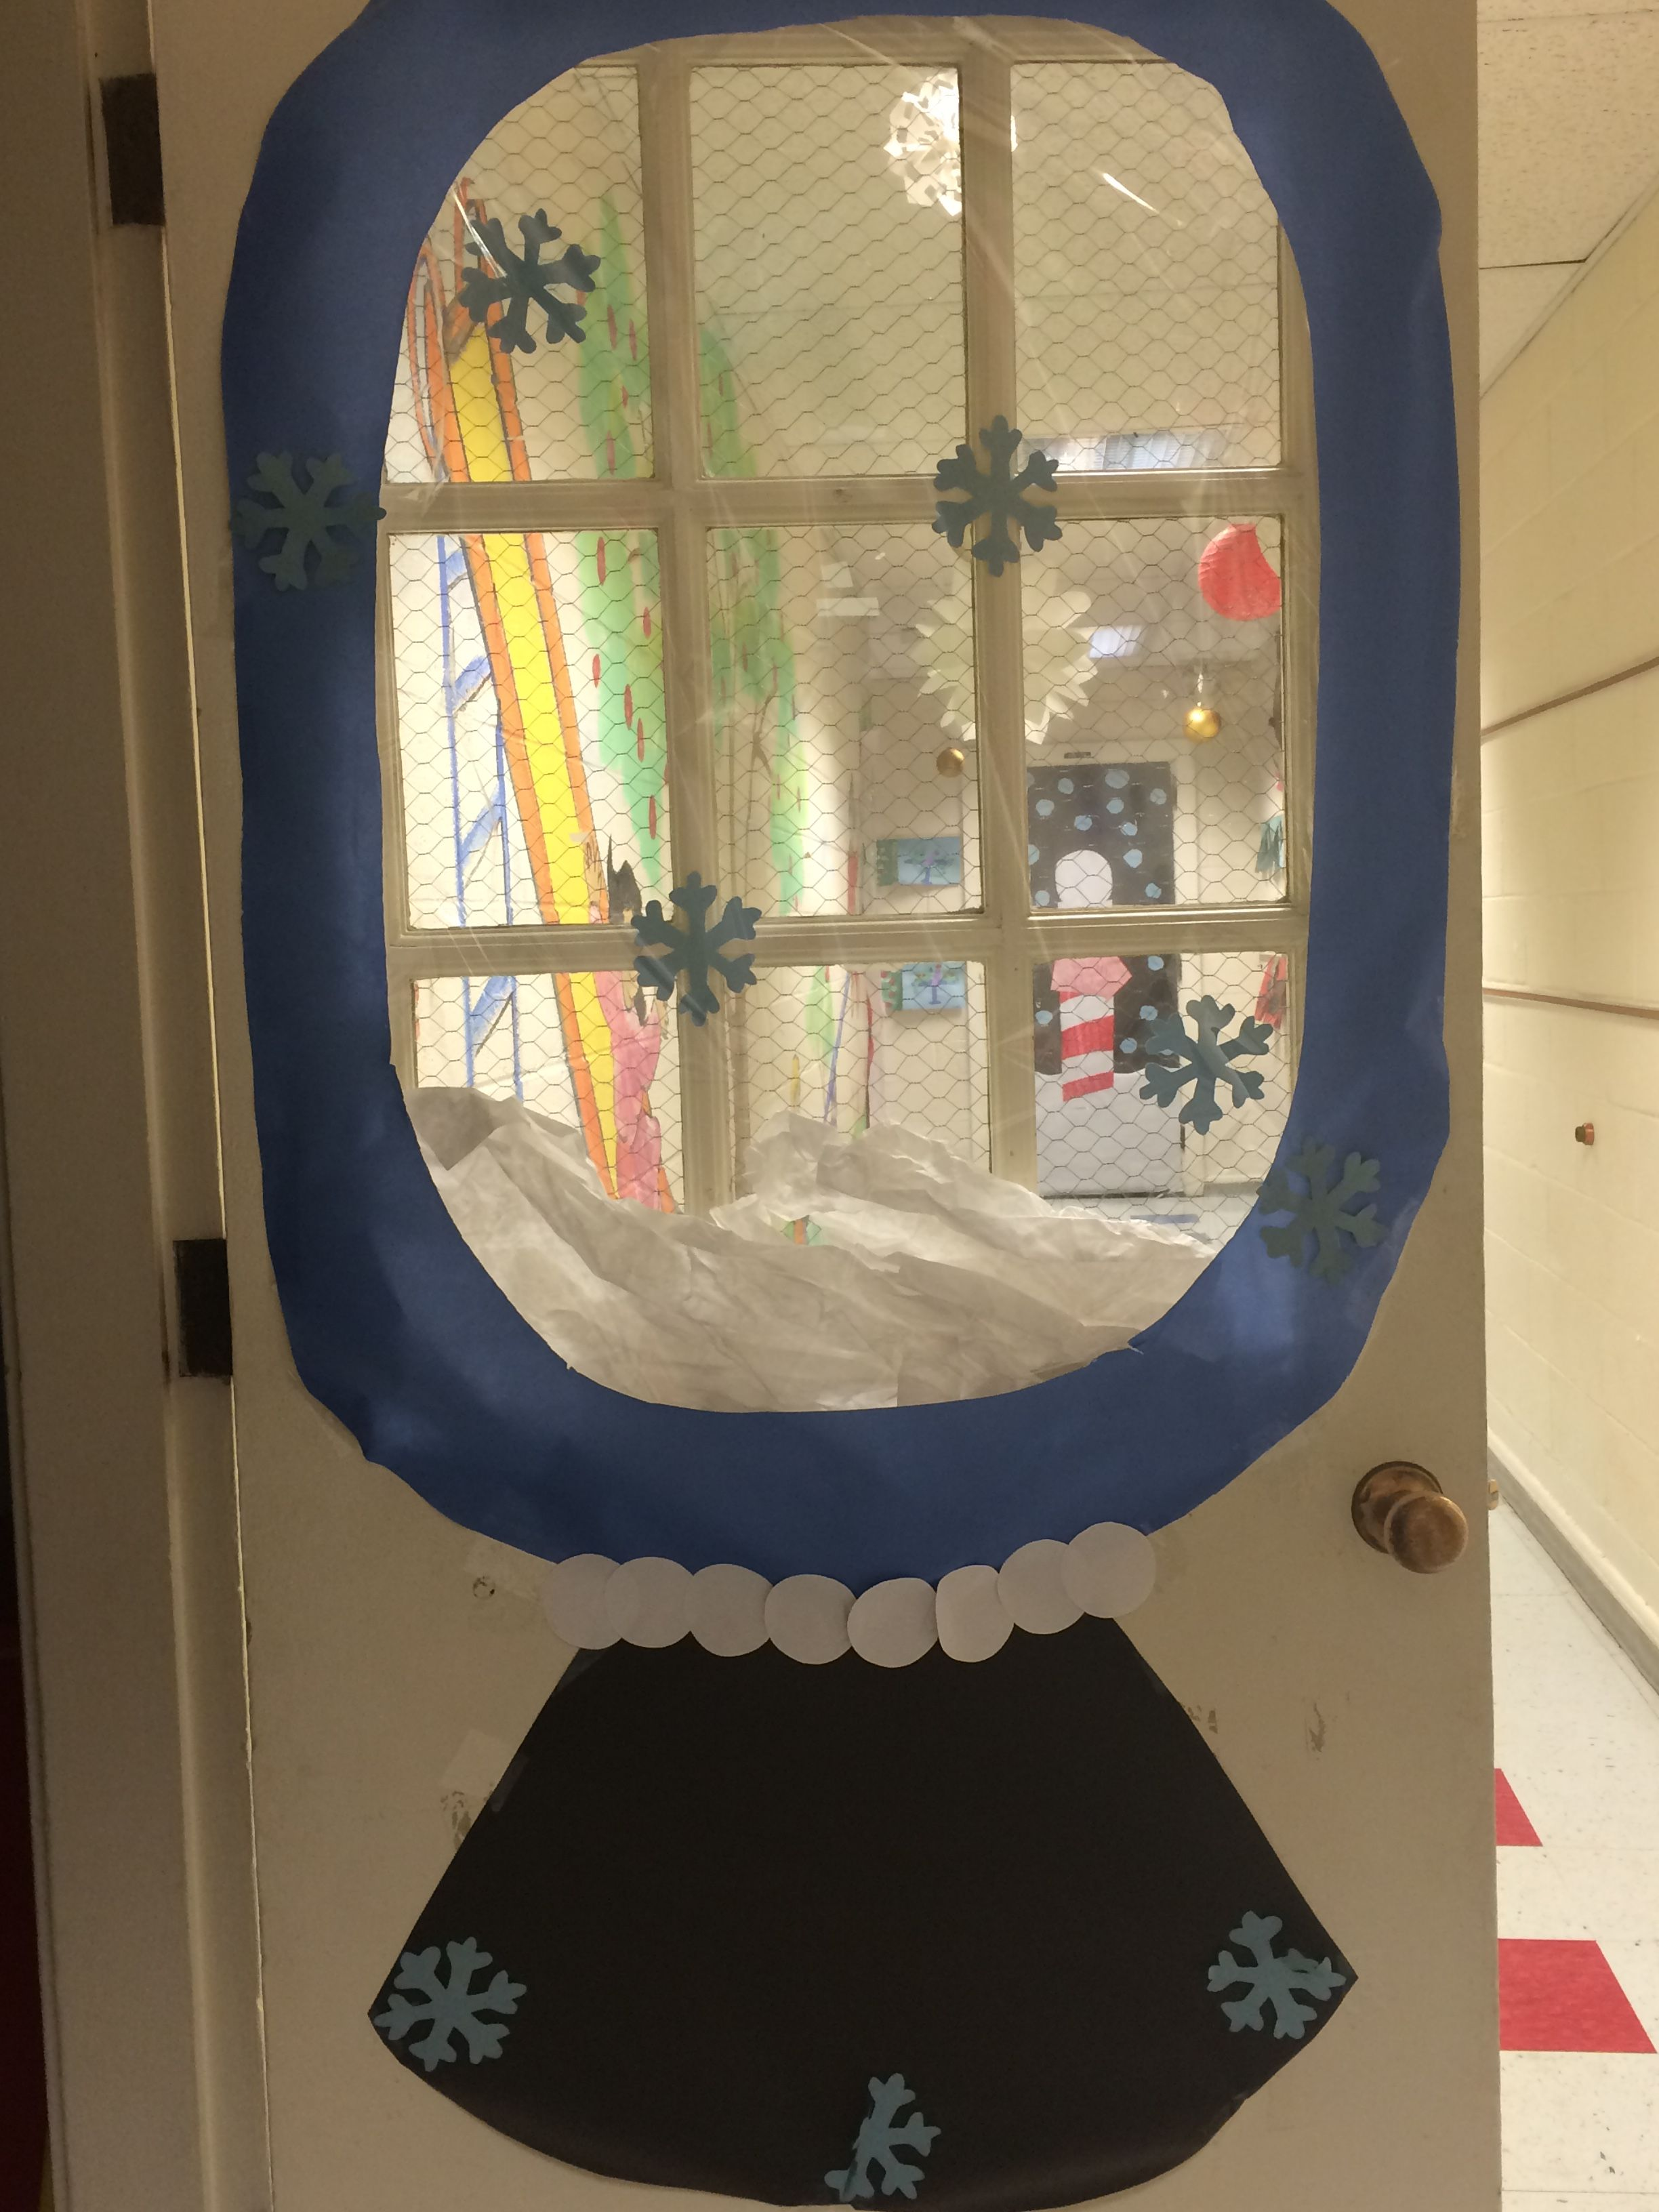 Classroom door window - Play Learn Hatboro Pa Snow Globe Cool Winter Wonderland Classroom